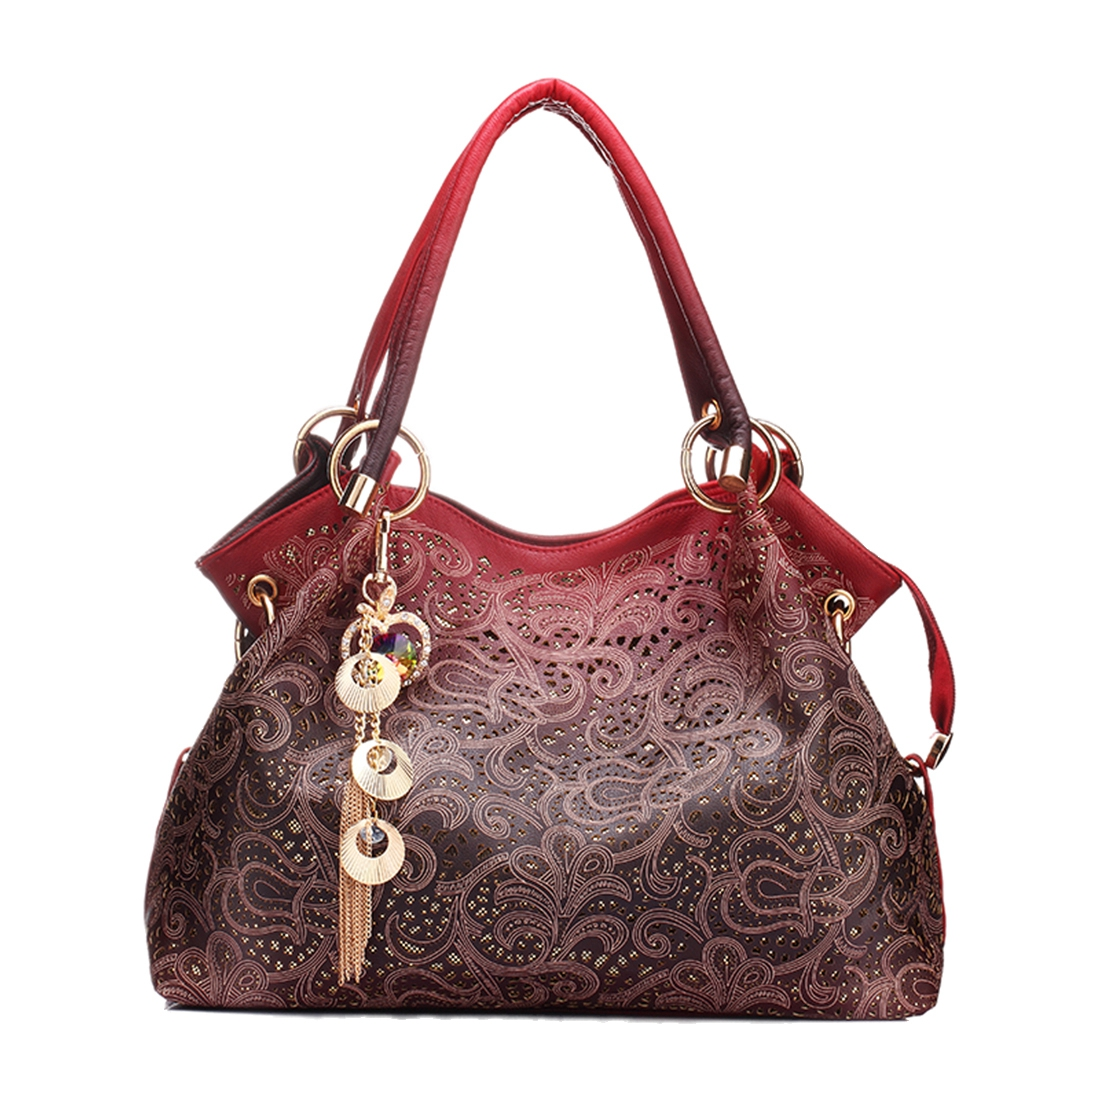 texu-women-handbag-leather-hollow-out-gradient-tassel-bag-brand-ladies-shoulder-messenger-bags